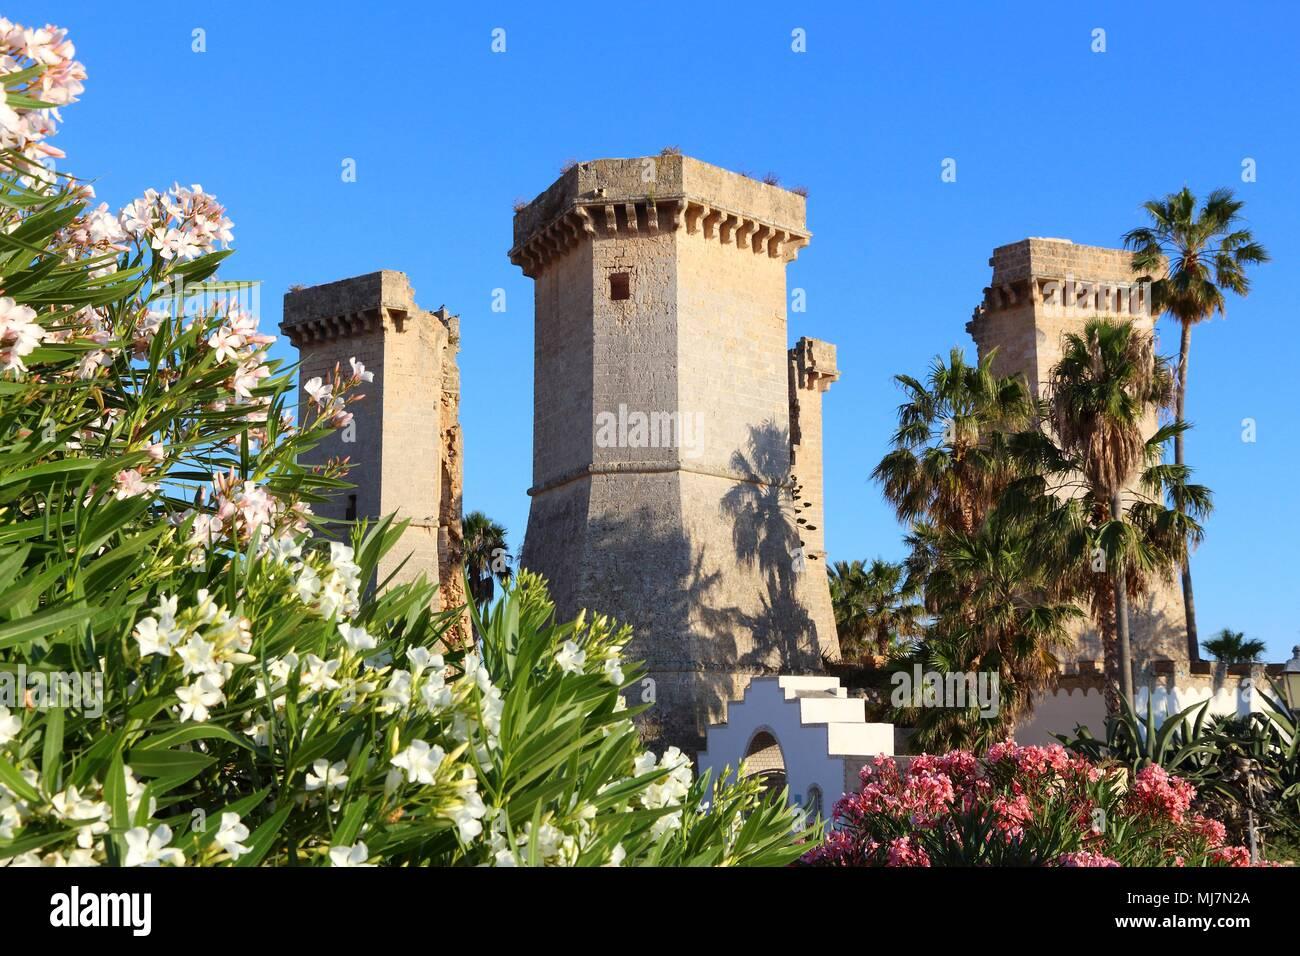 Apulia landmark - Quattro Colonne ruined towers in Santa Maria Al ...